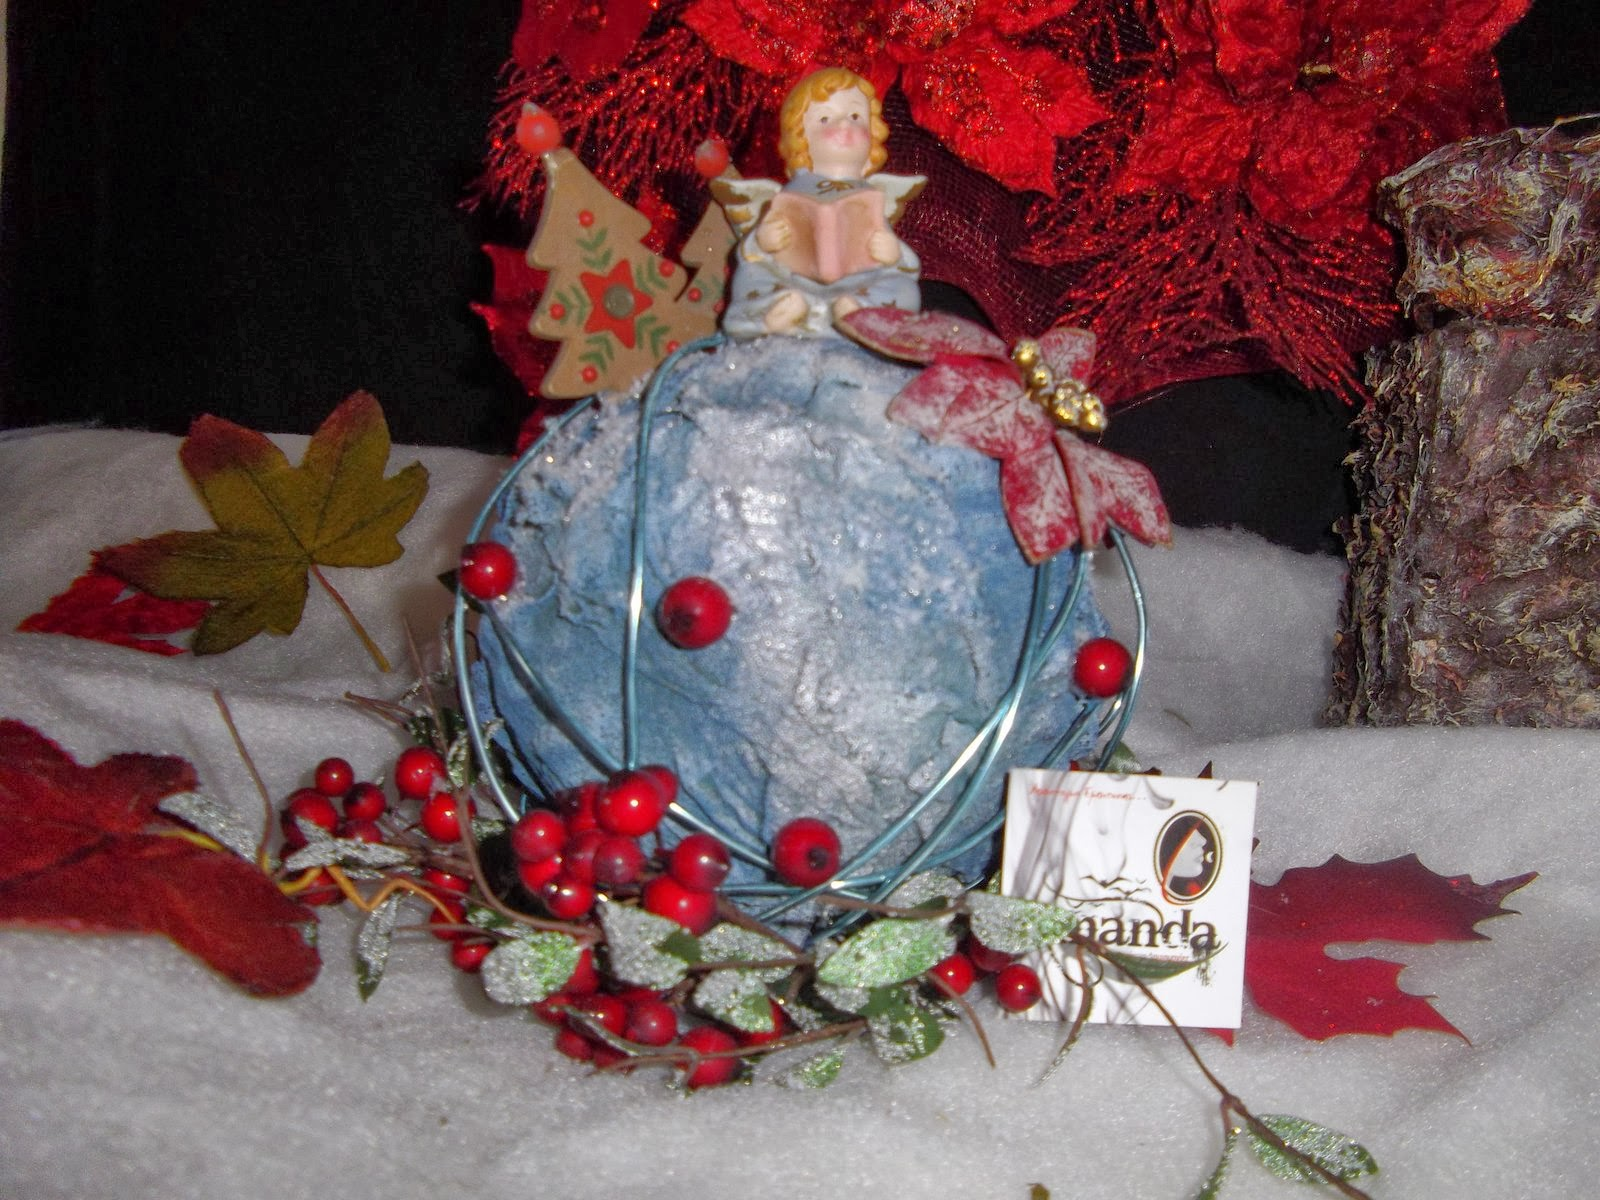 c9f5542c361 Amanda's Handmade Creations: Πρωτότυπες ιδέες για δώρα και ...